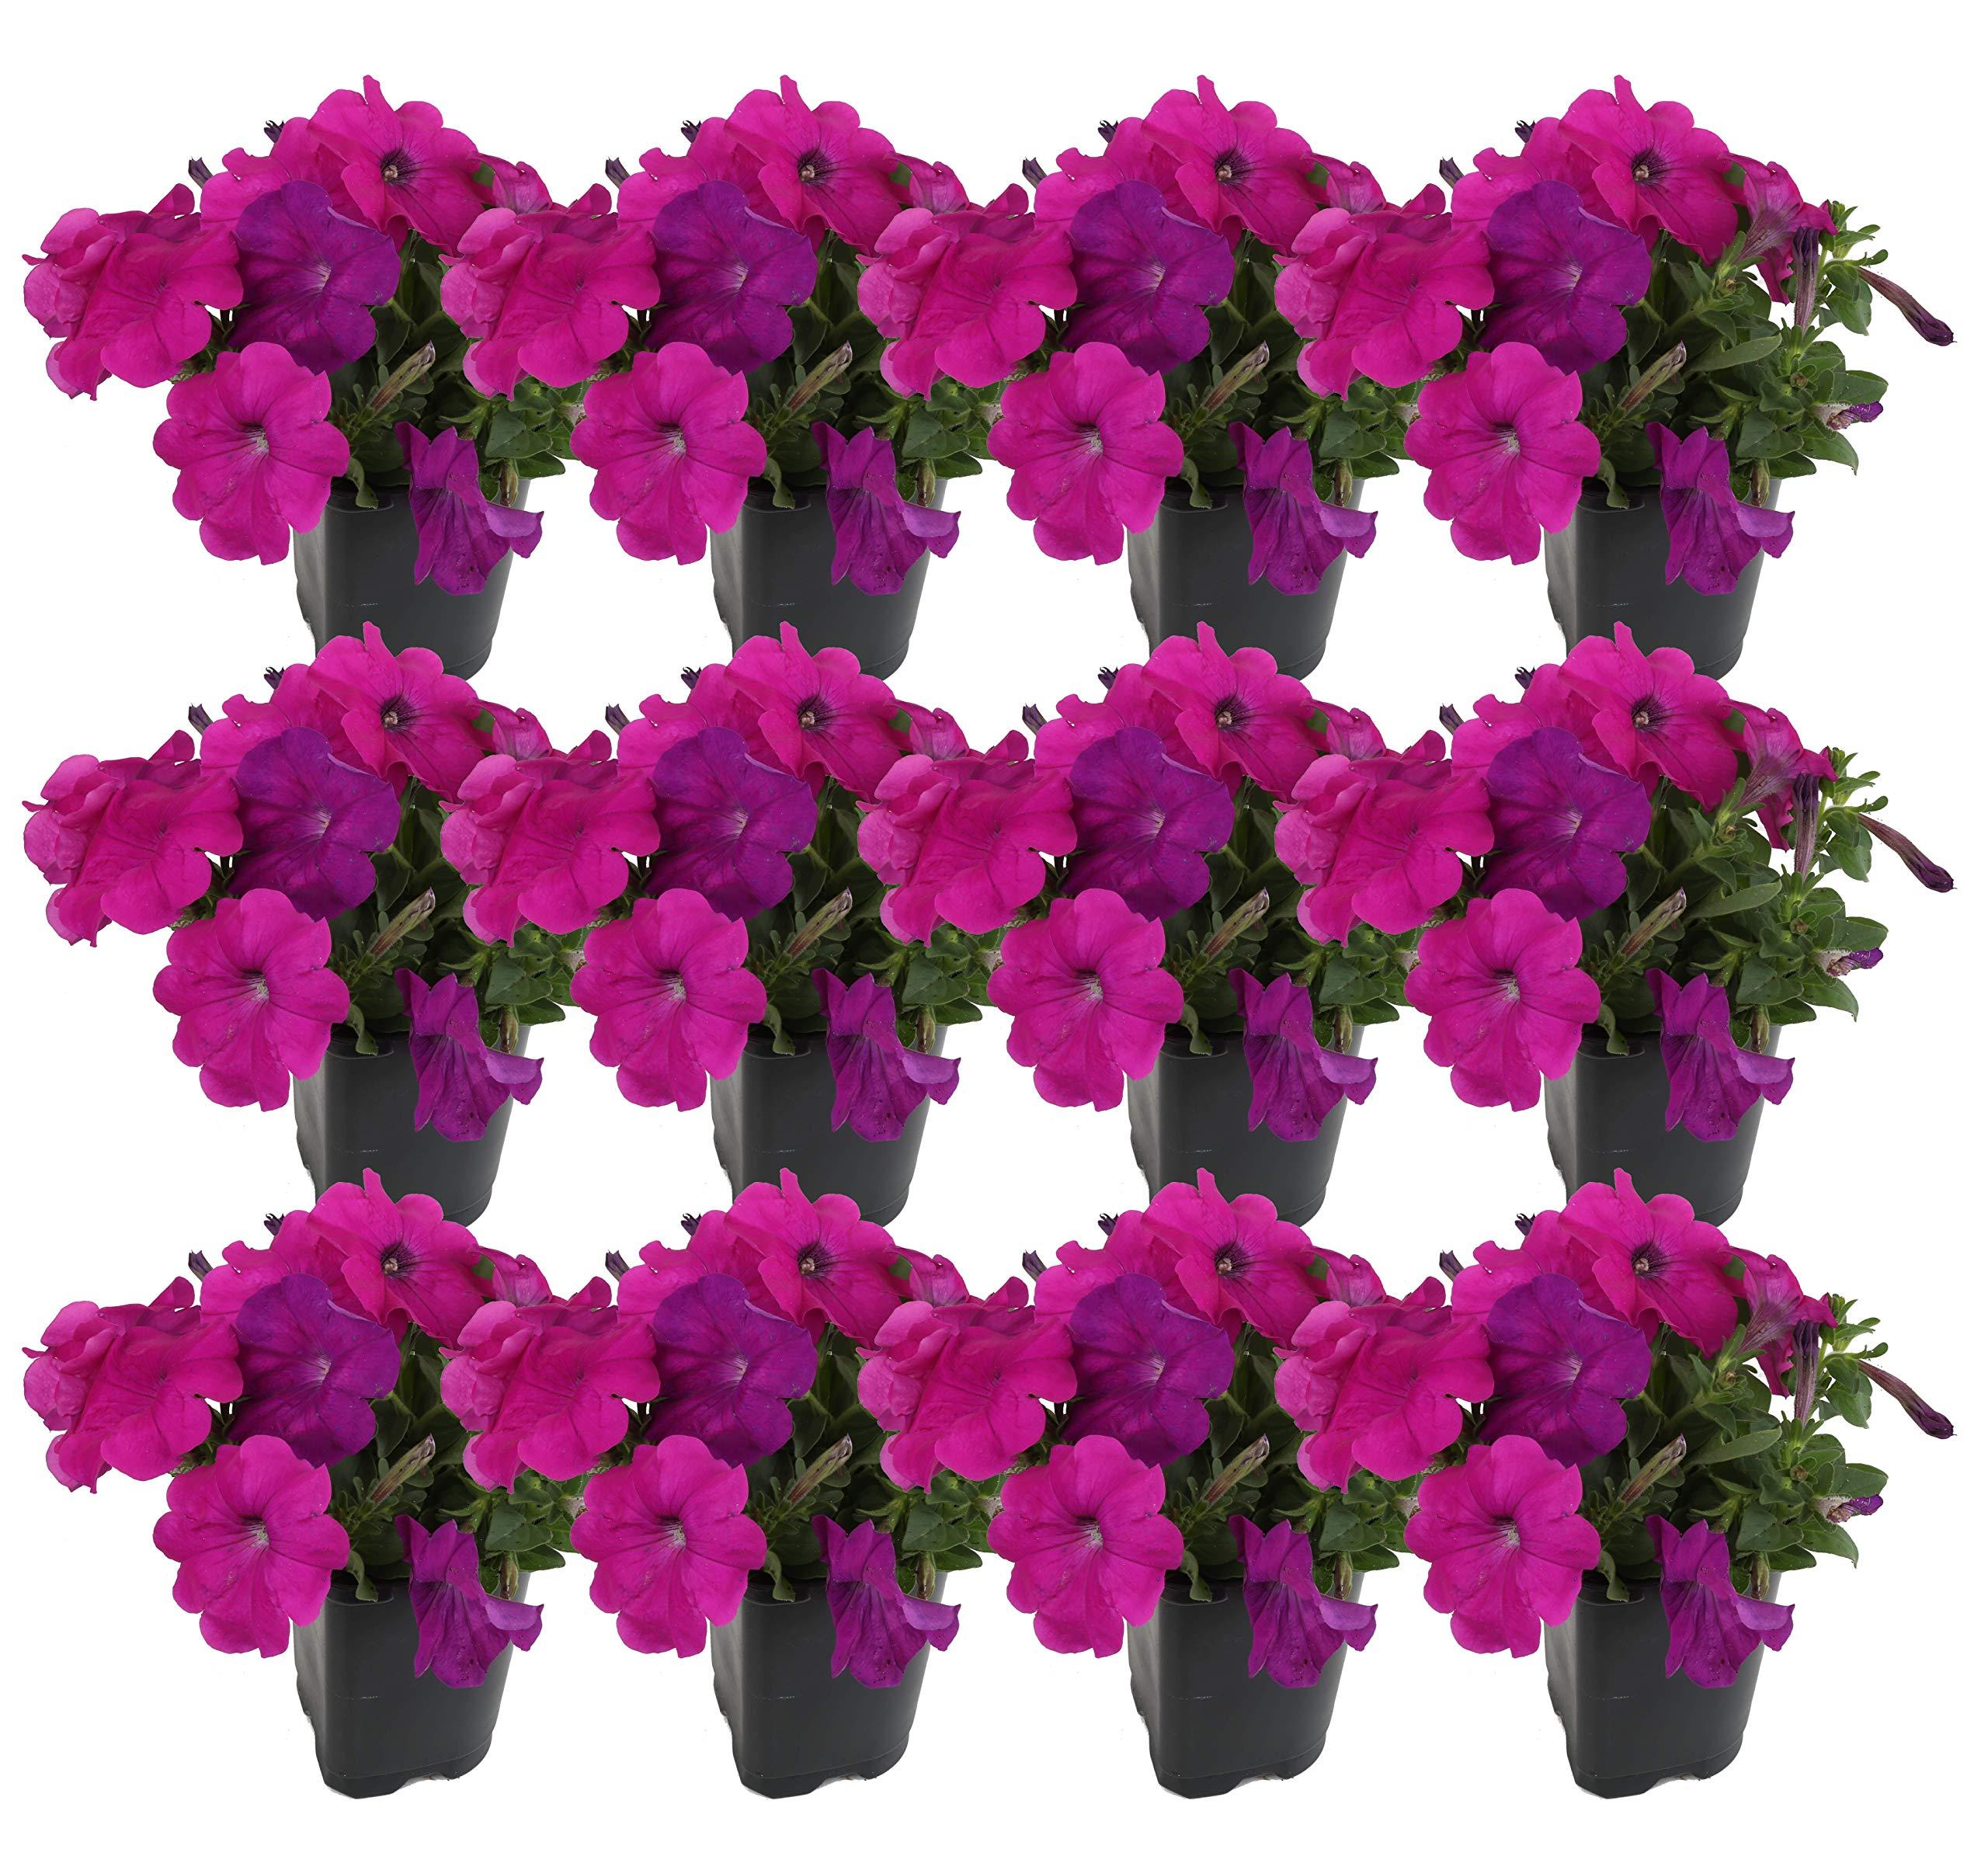 Costa Farms Petunia Live Outdoor Plant 1 PT Grower's Pot, 12-Pack, Purple